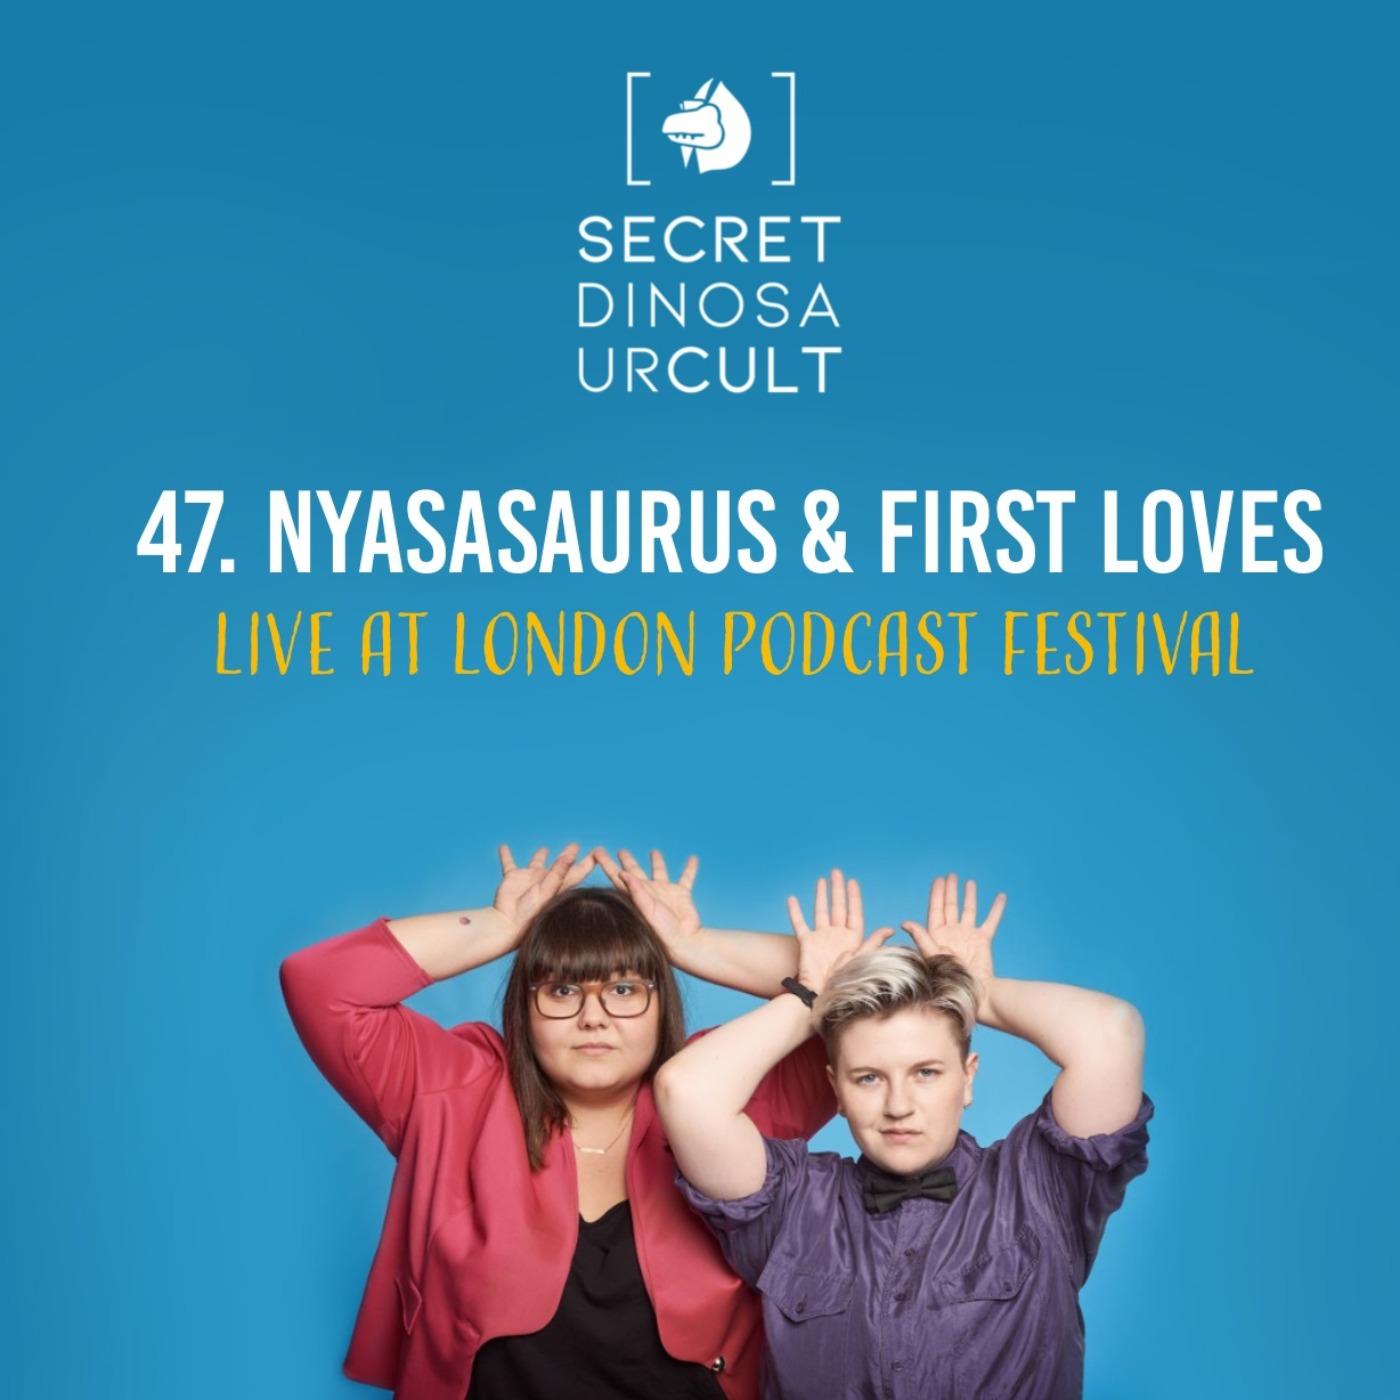 Nyasasaurus & First Loves: Live at London Podcast Festival